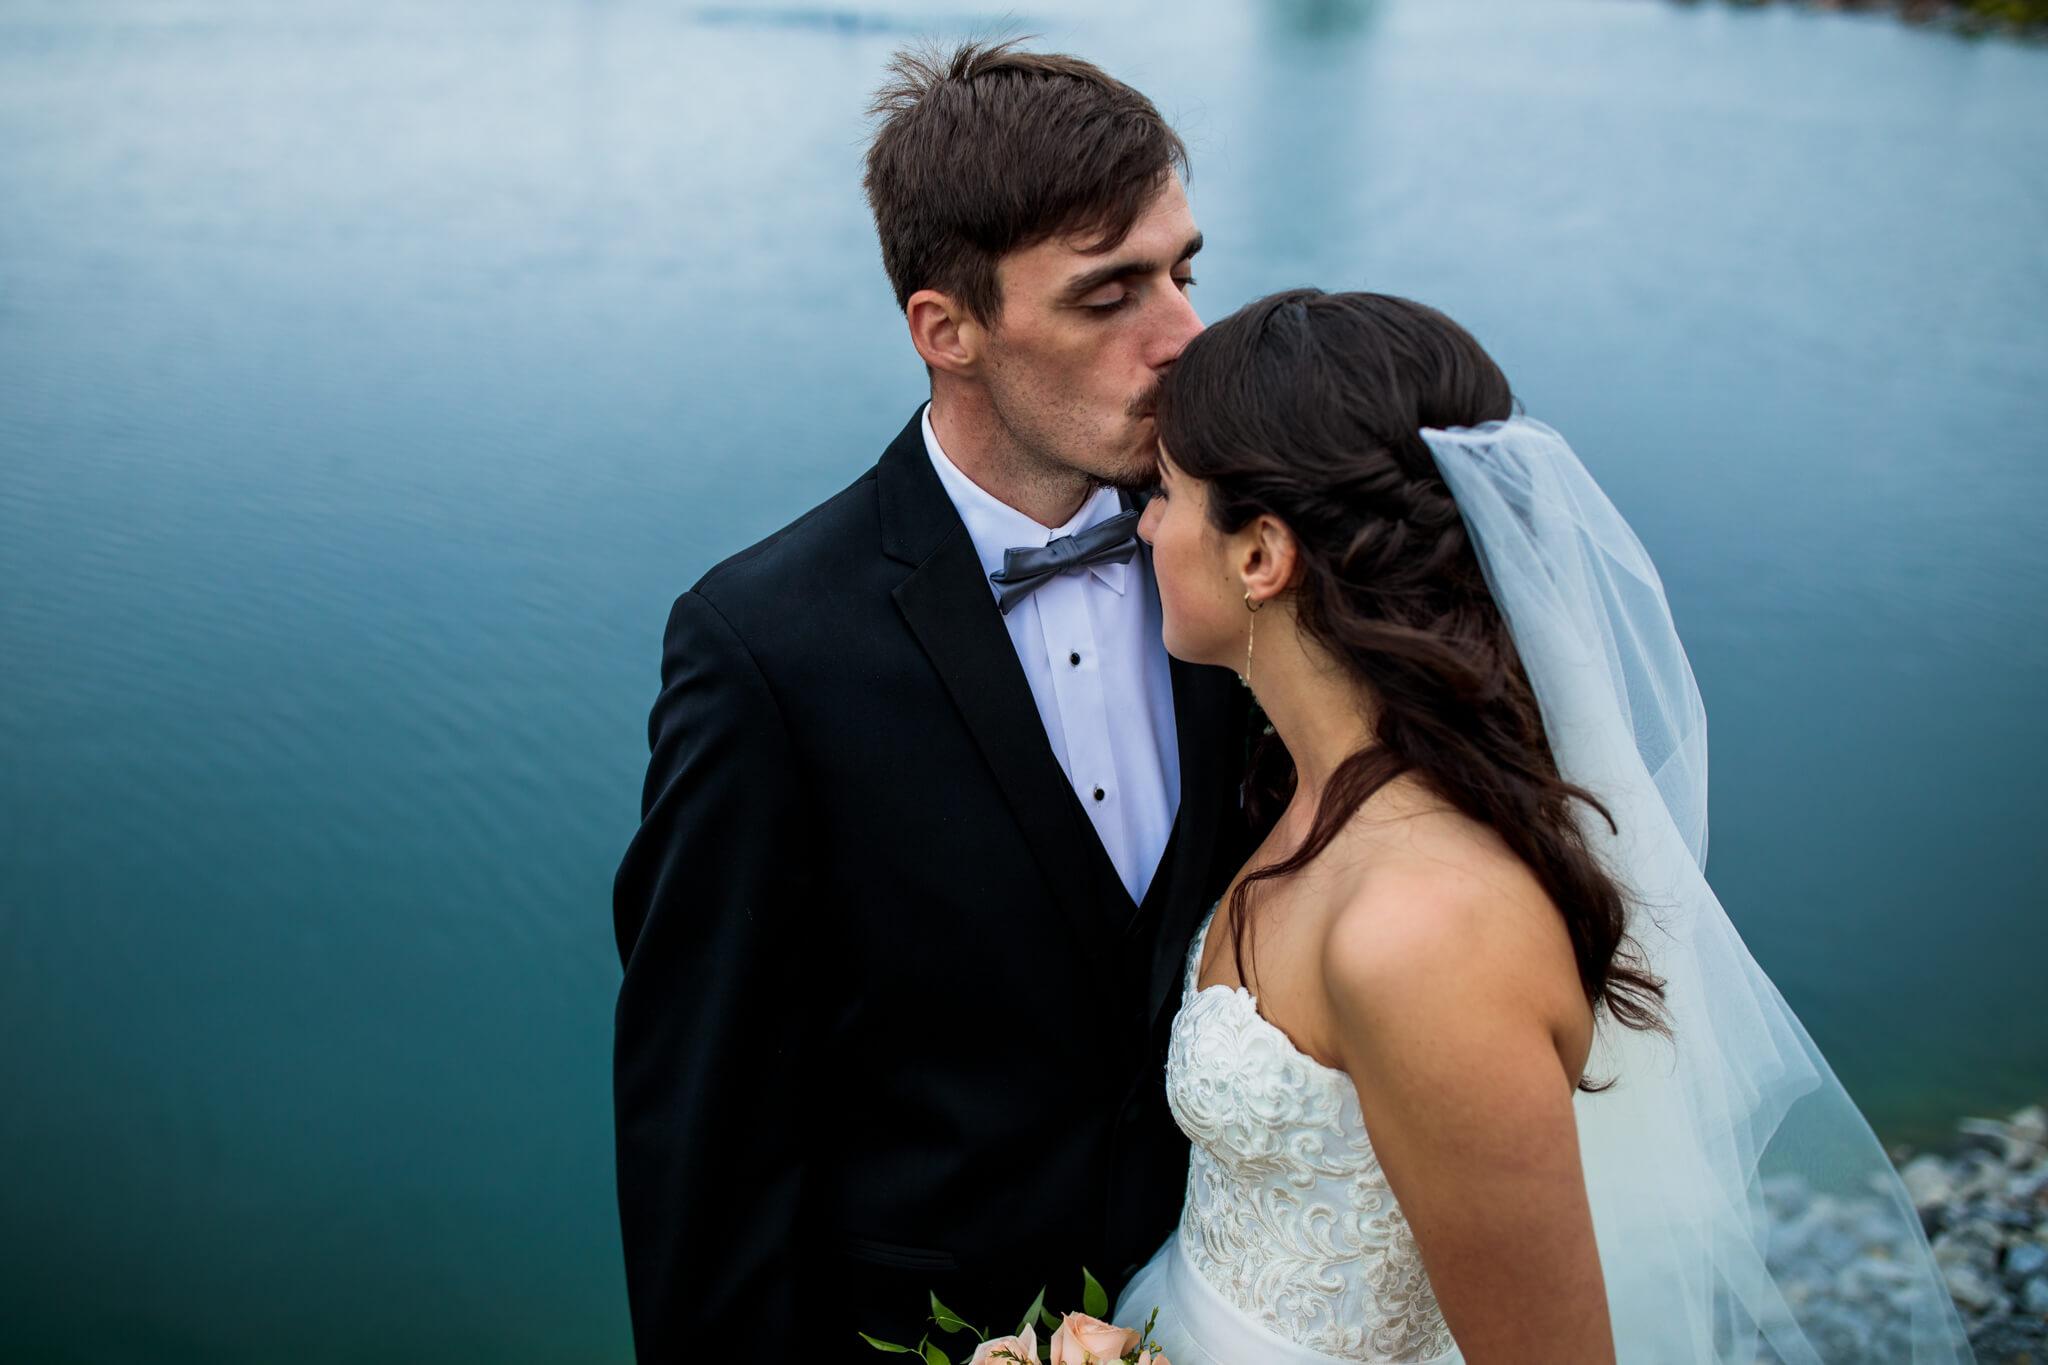 Alysia Jerad Homestead Blessings Farm Hershey PA Wedding Rustic Chique - 110.JPG